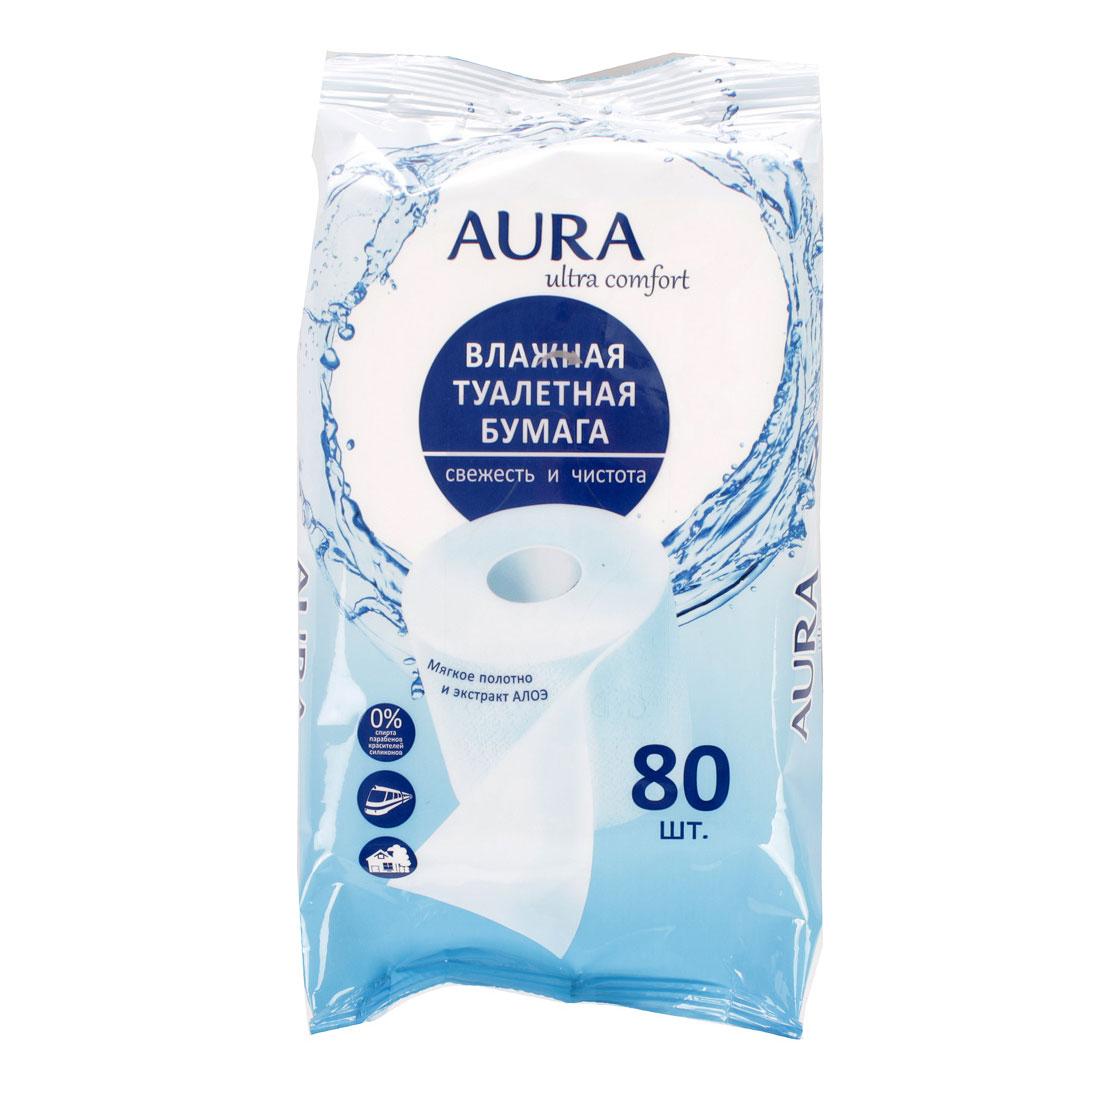 ������� ��������� ������ Aura 80 ��